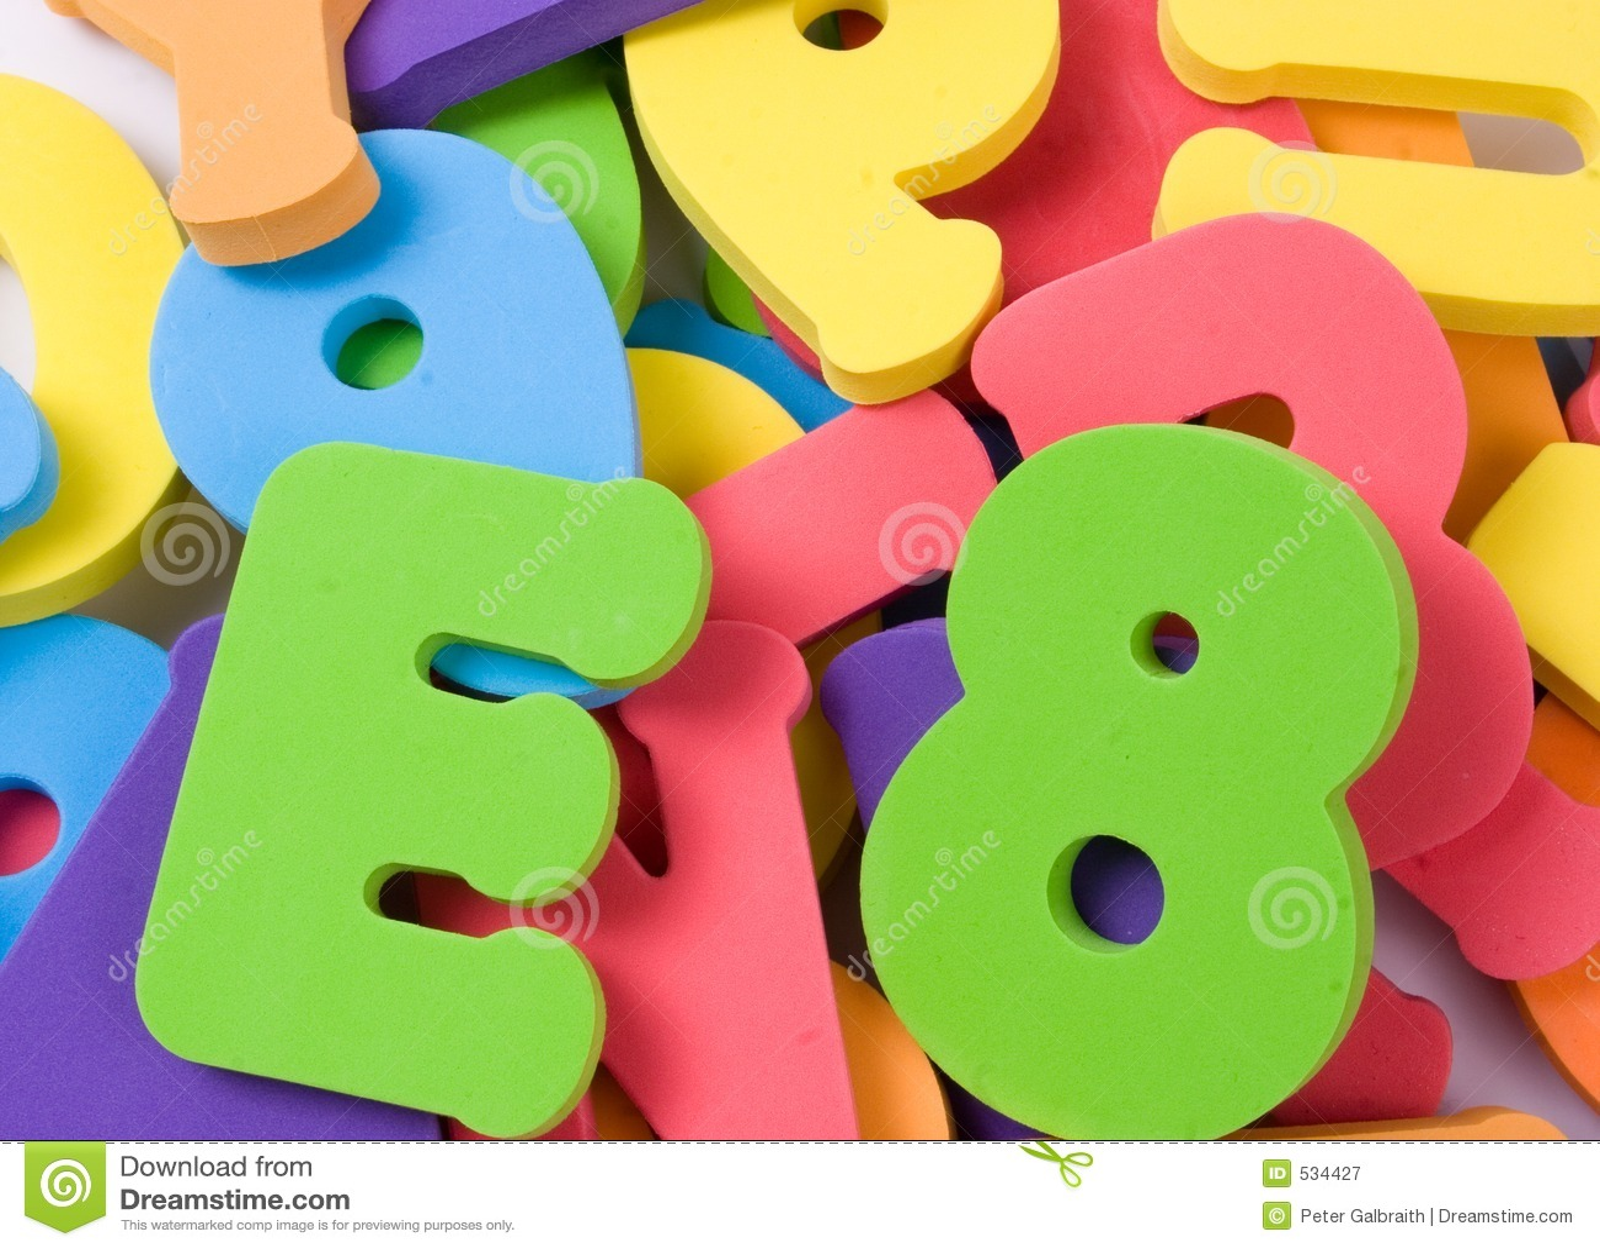 Download 信函 库存图片. 图片 包括有 字体, 子项, 了解, 语言, 五颜六色, 学生, 学校, 作用, 幼稚园, 英语 - 534427